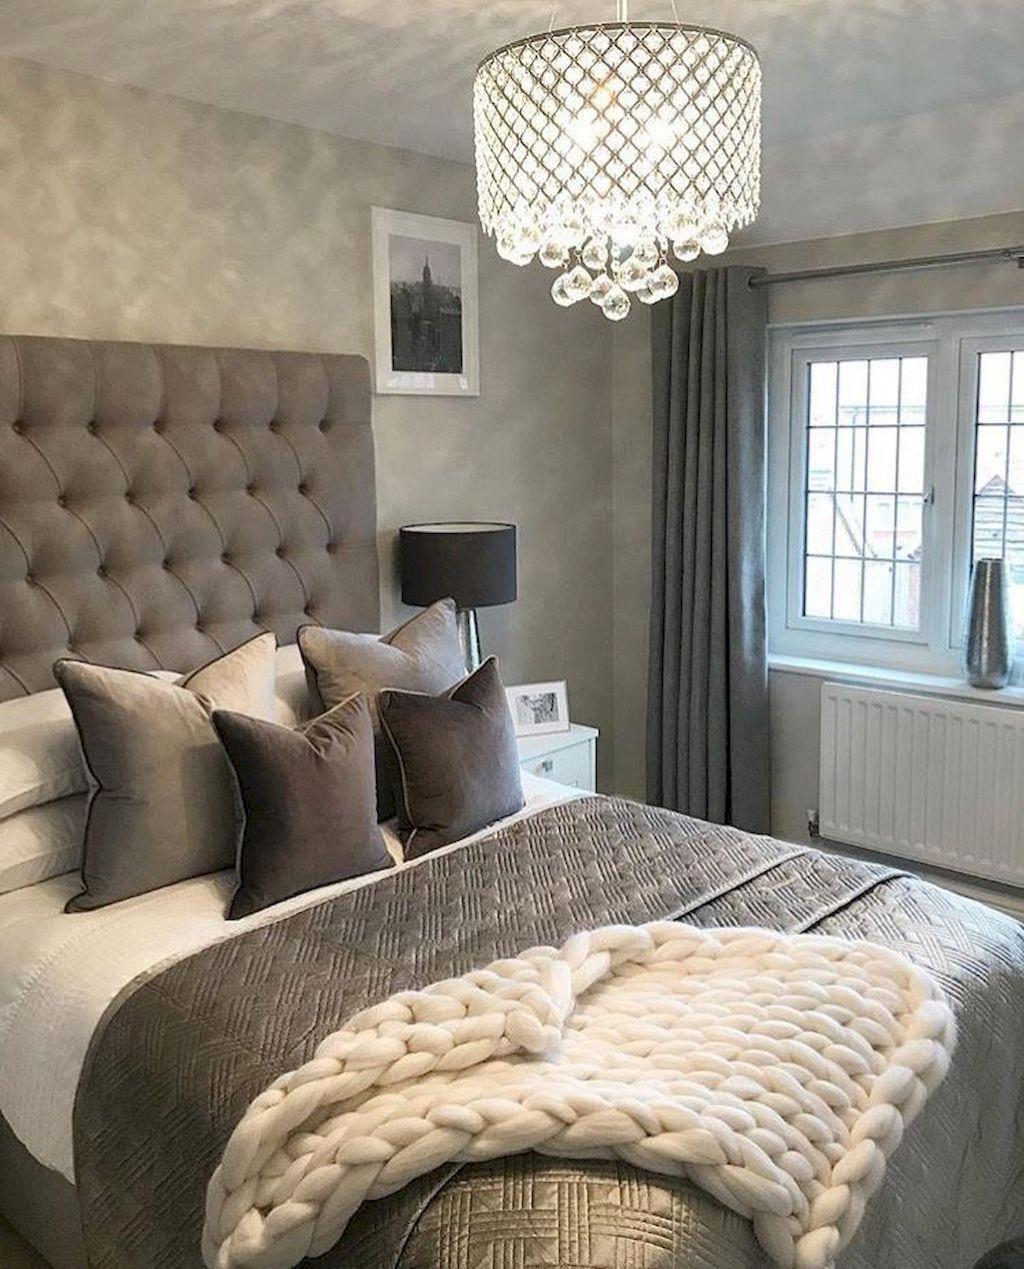 Best Pin By Nawaz On Nawaz In 2020 Home Decor Bedroom Master 640 x 480